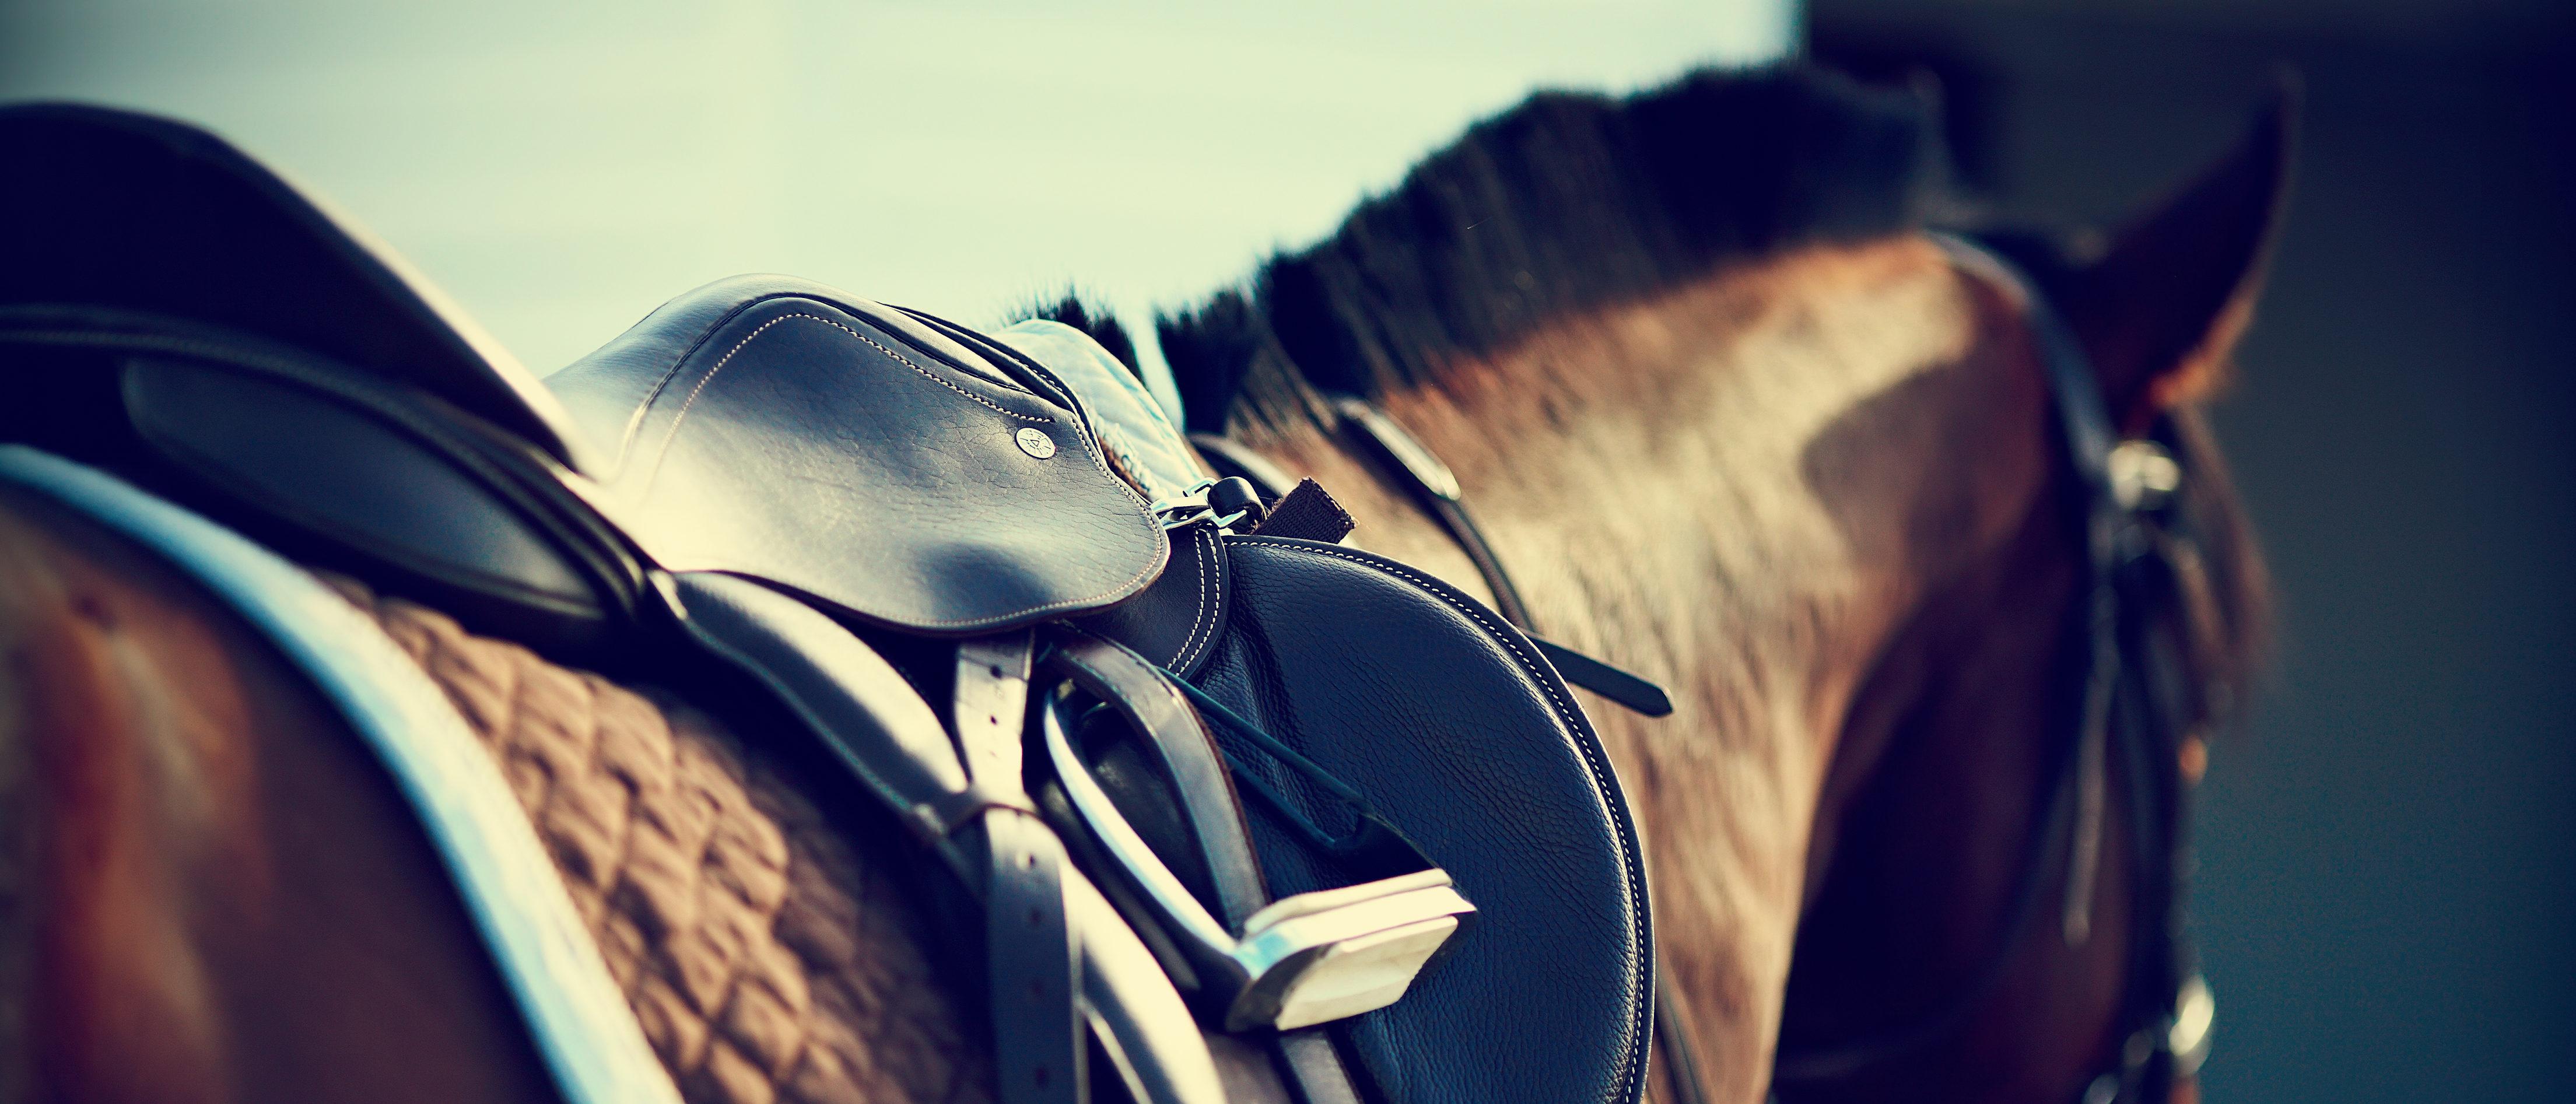 Pitcture of horse. (Shutterstock/Elya Vital)